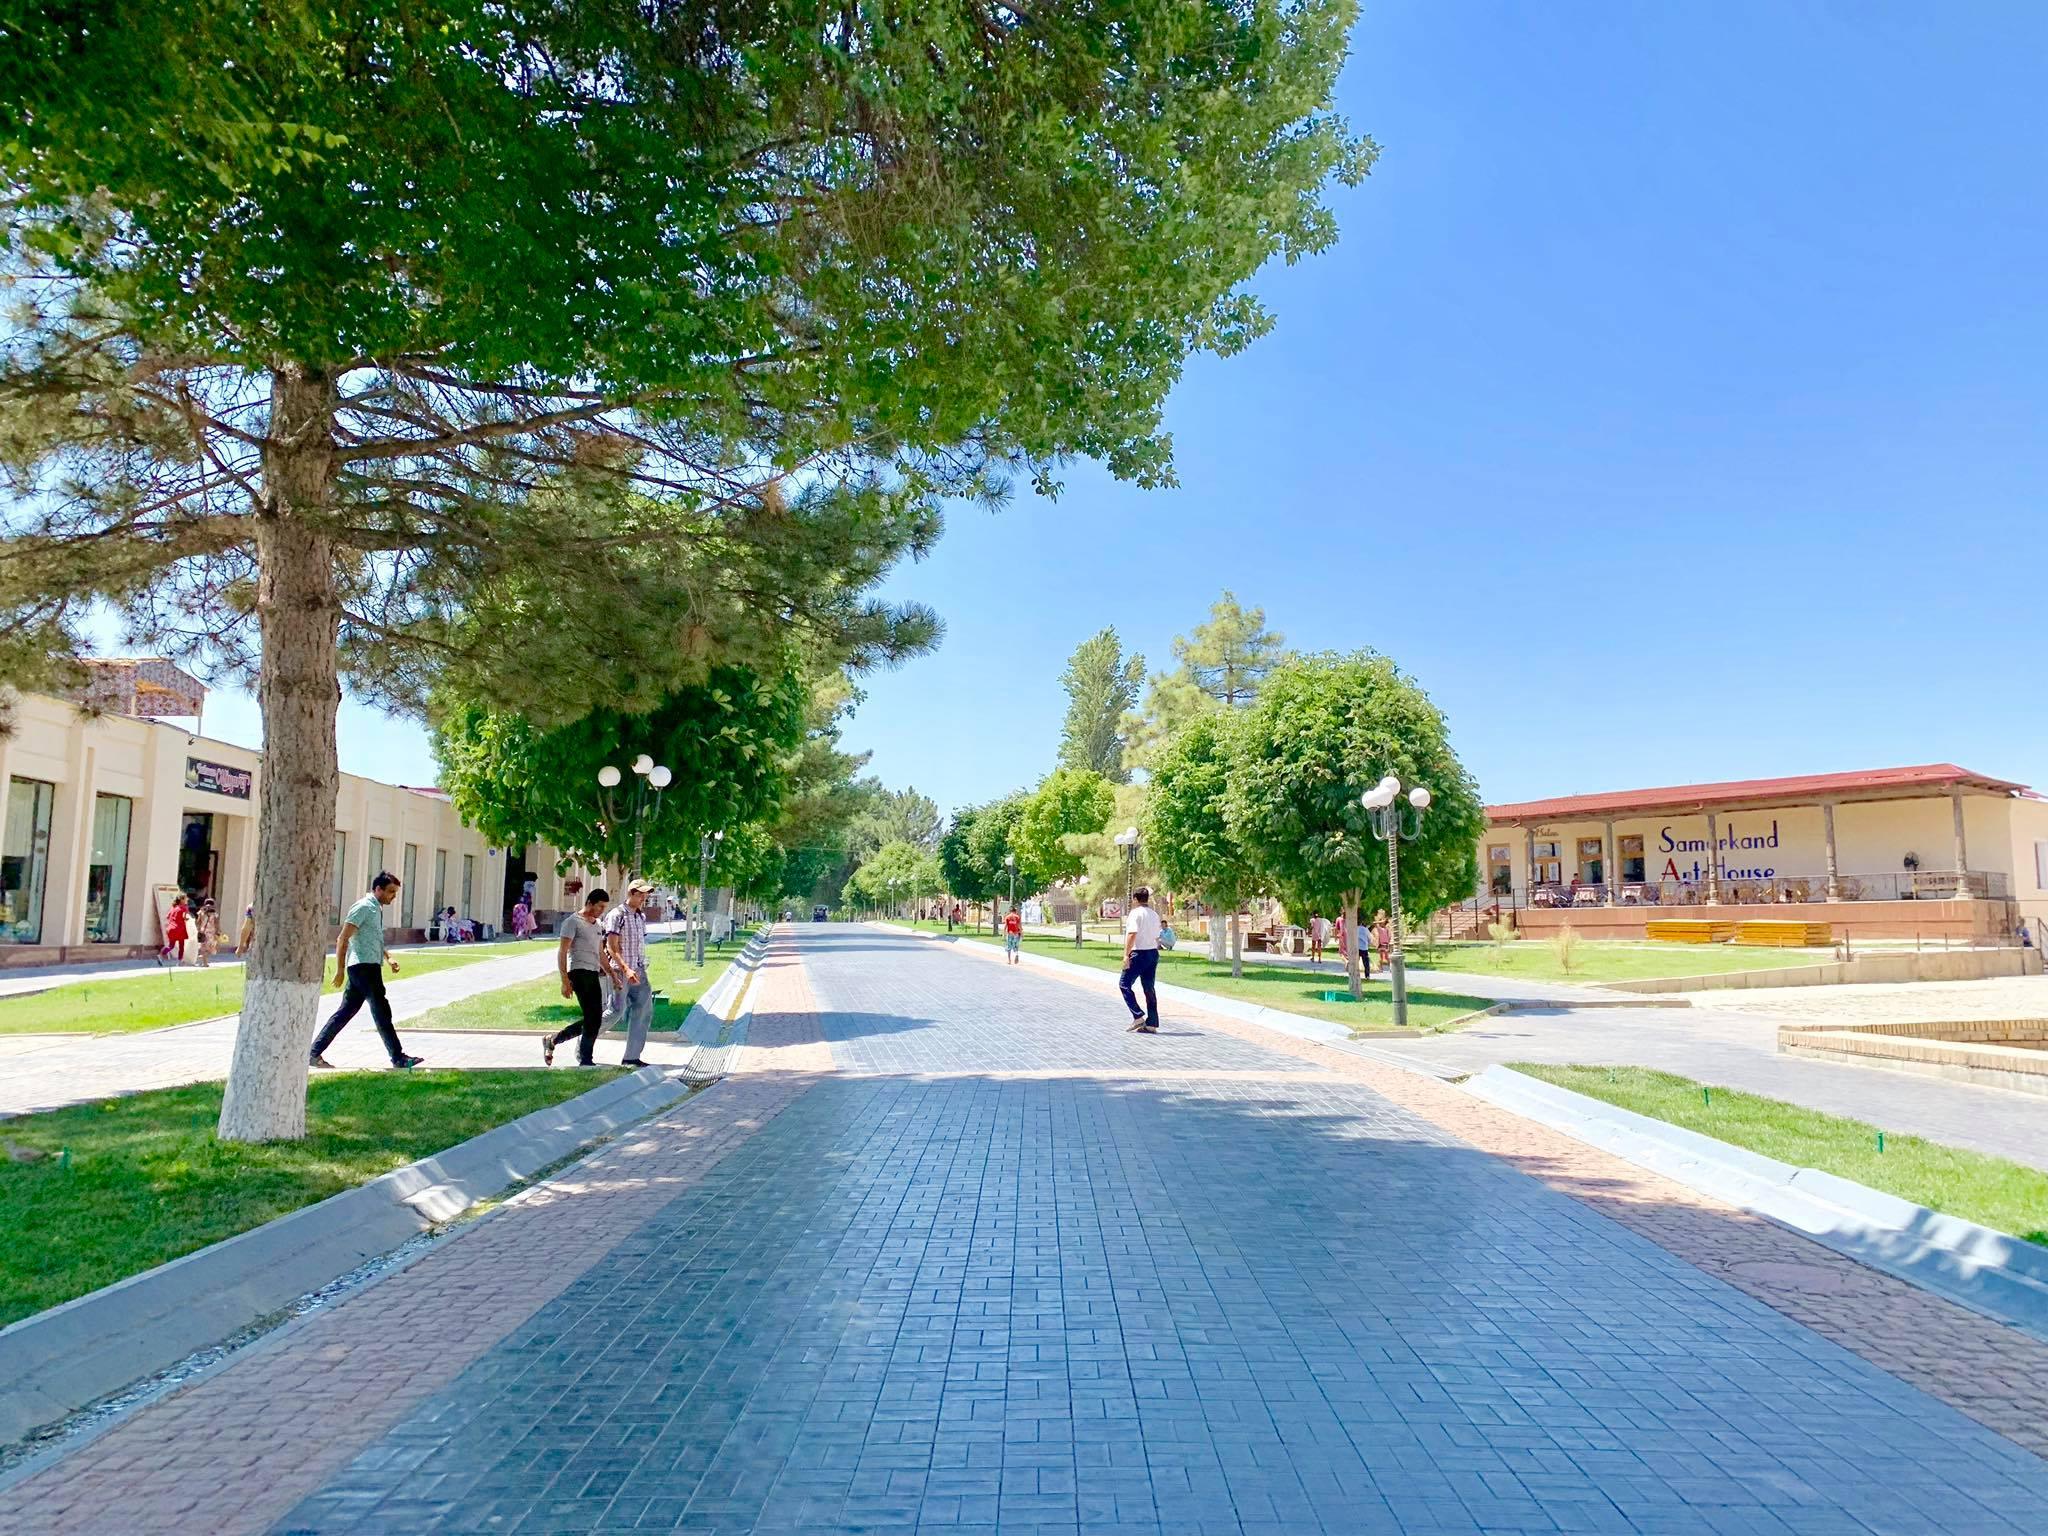 Kach Solo Travels in 2019 Siyab Bazaar and Registan on my first day in Samarkand13.jpg